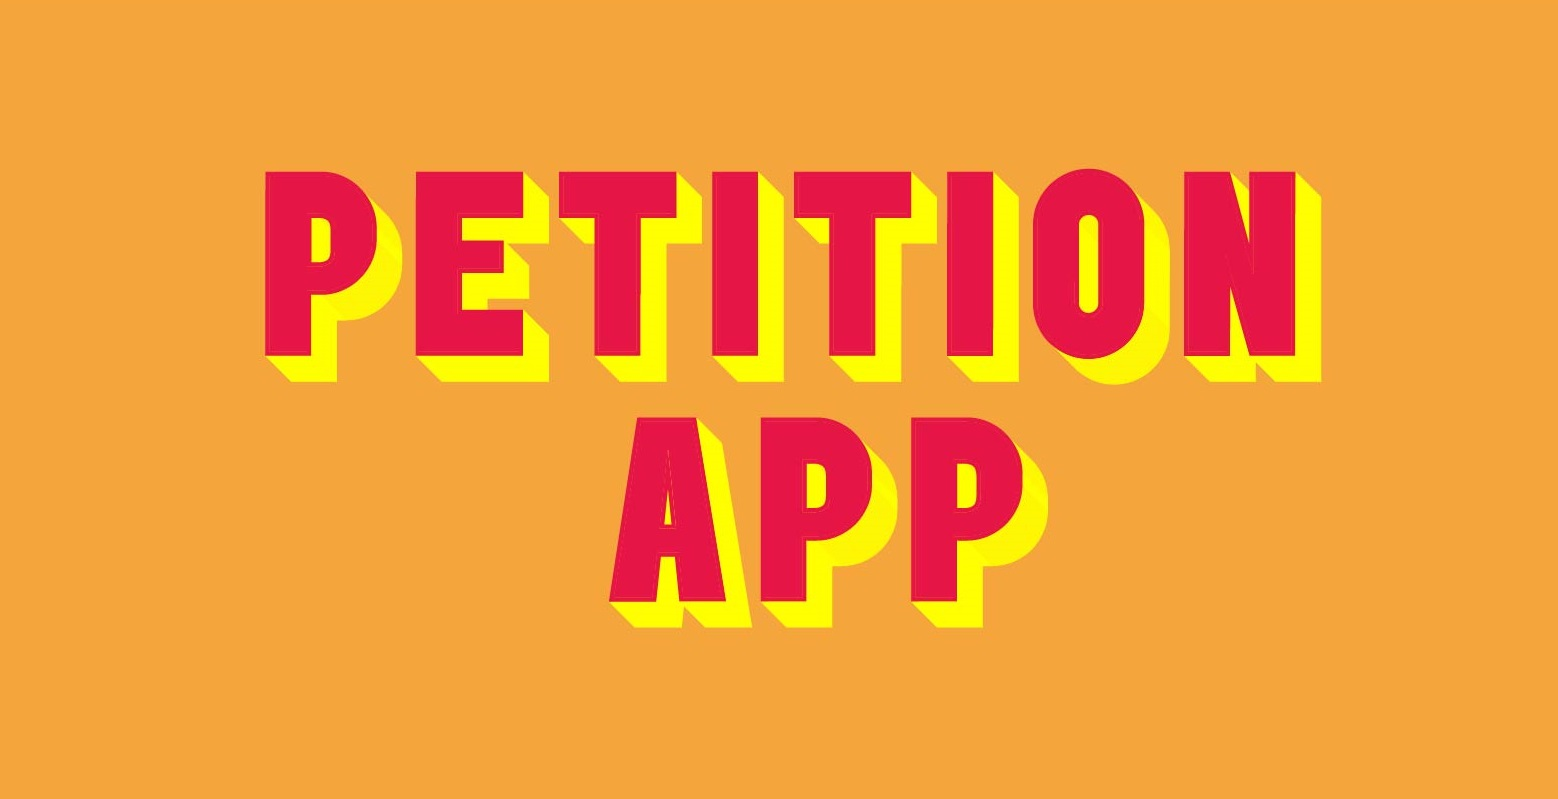 Petition App